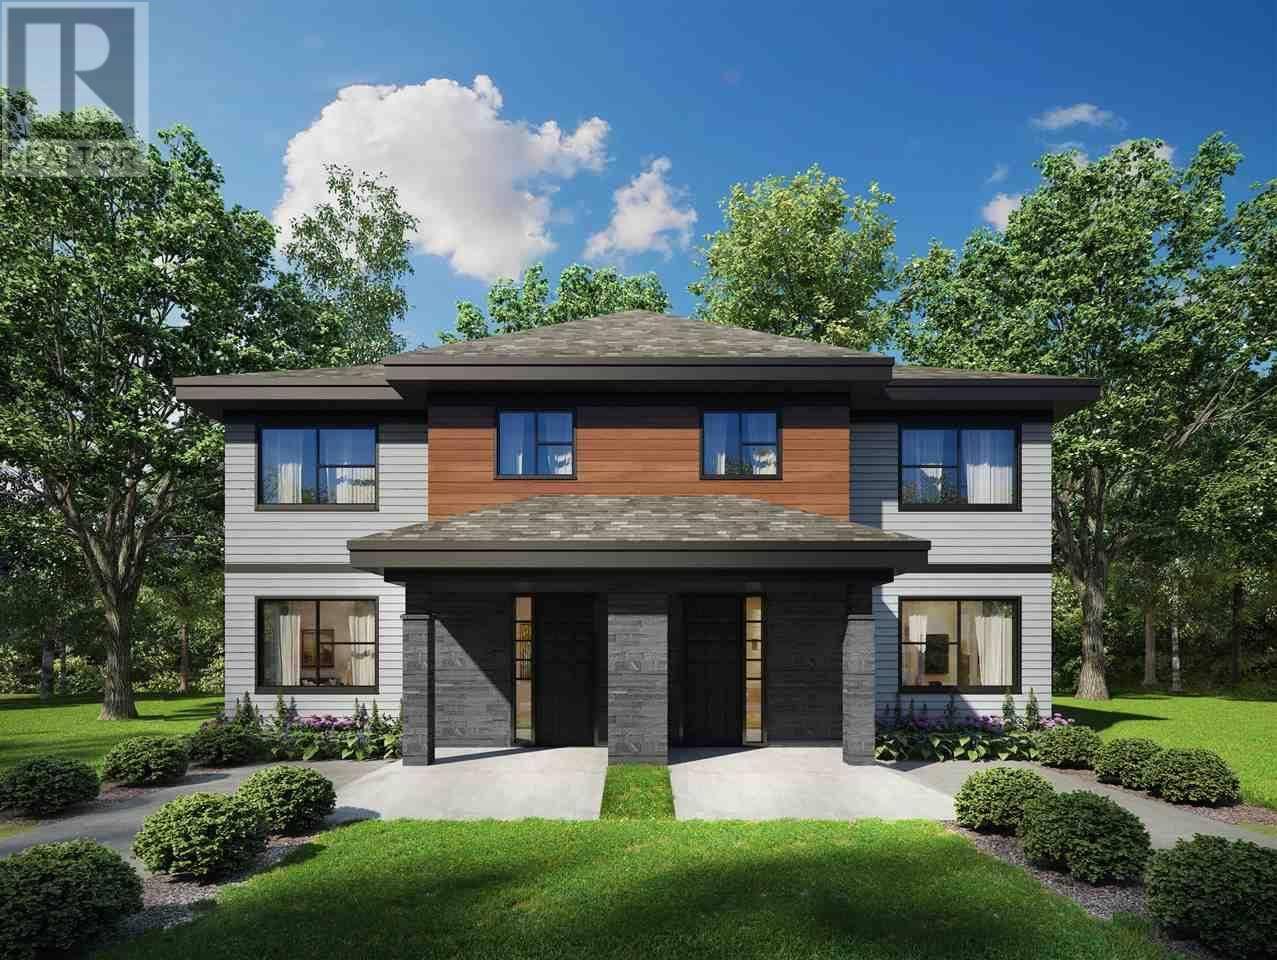 House for sale at 756 Herring Cove Rd Unit B Herring Cove Nova Scotia - MLS: 201919219